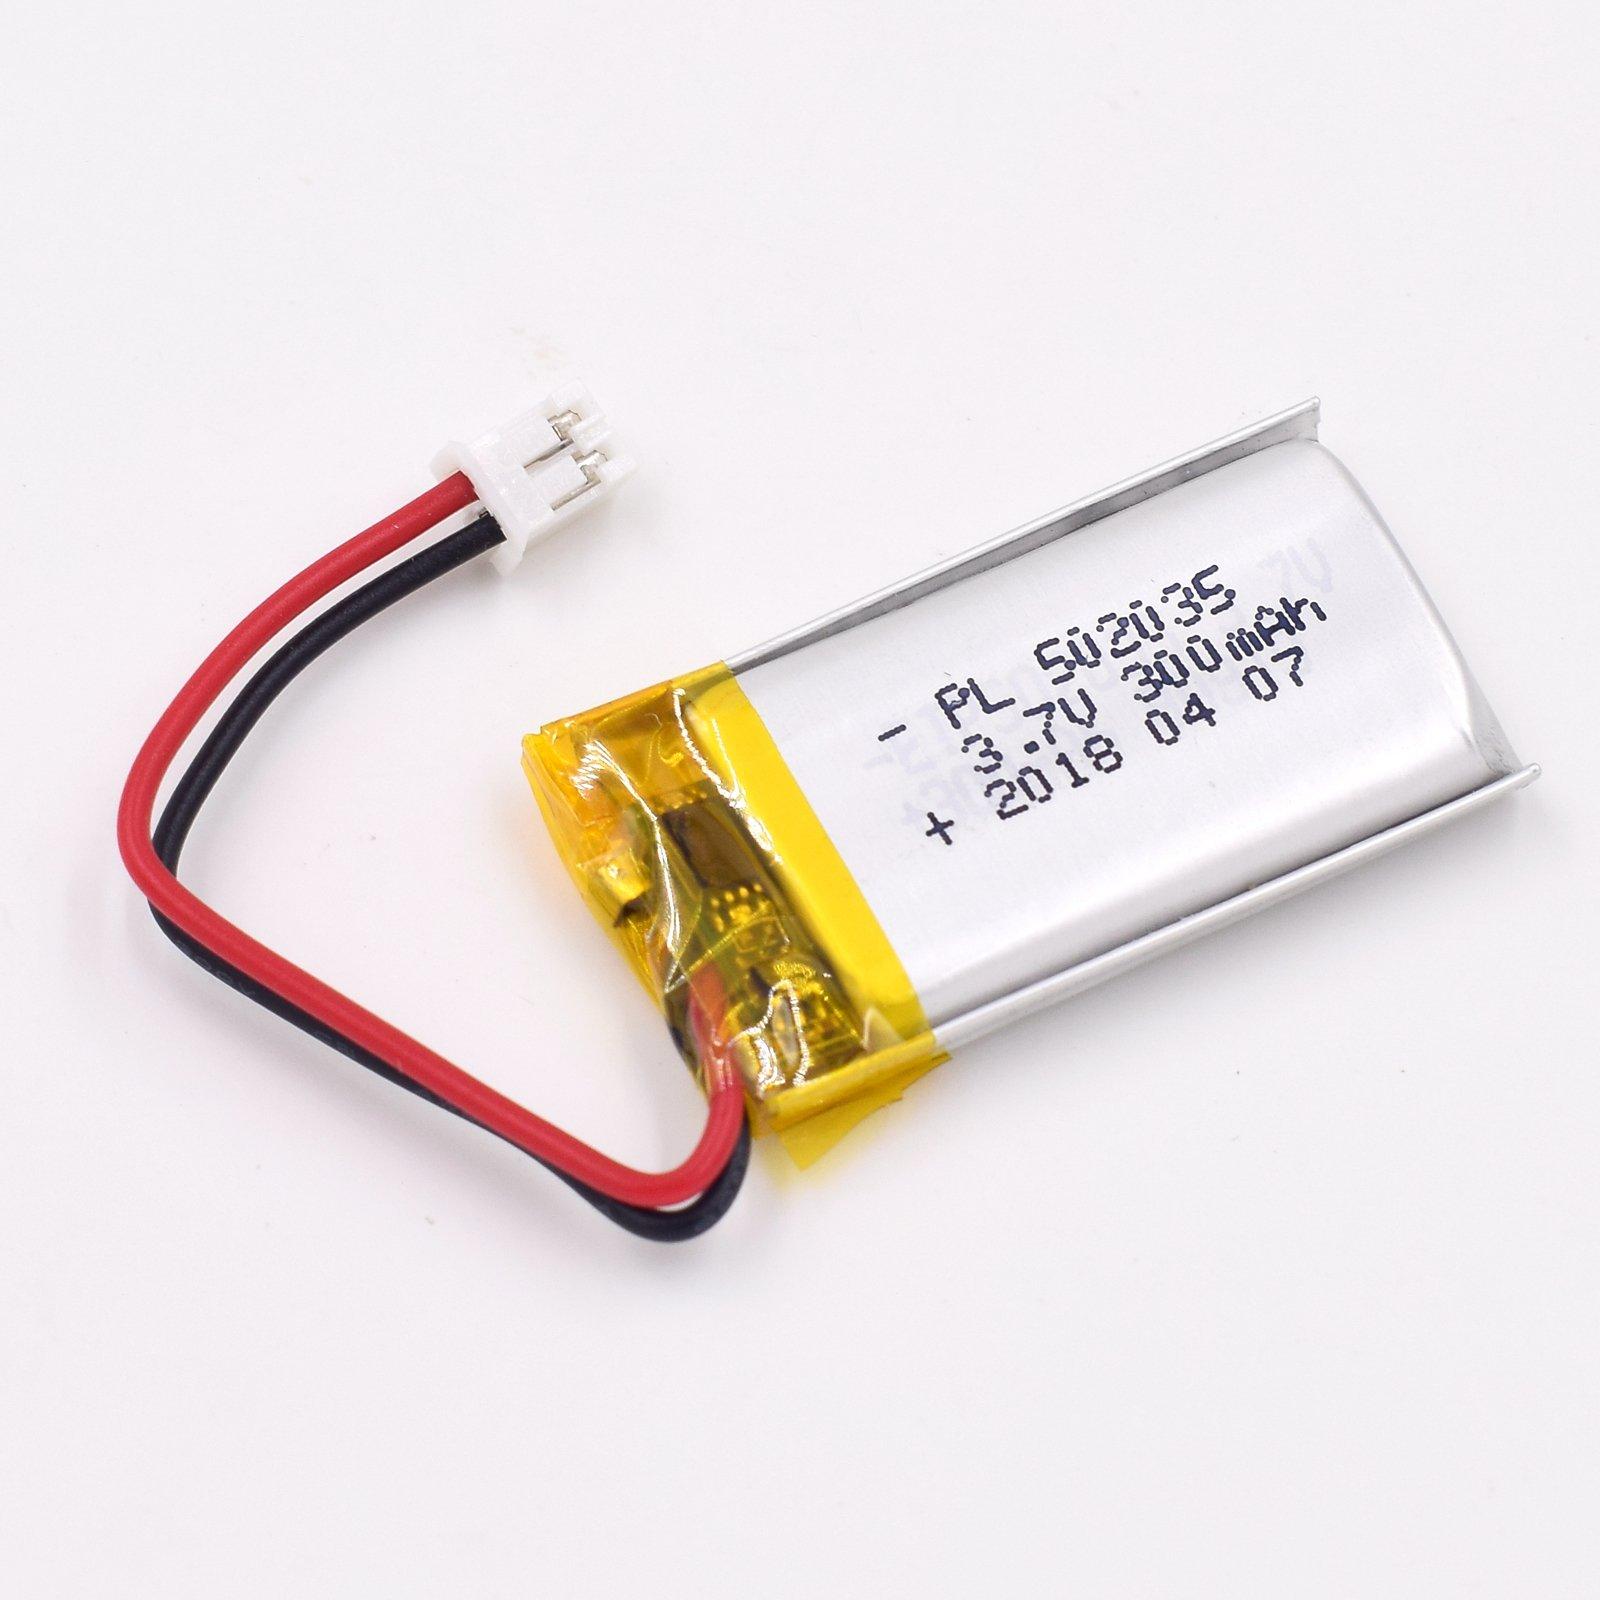 Bateria Lipo 3.7V 300mAh 502035 Recargable JST Conector